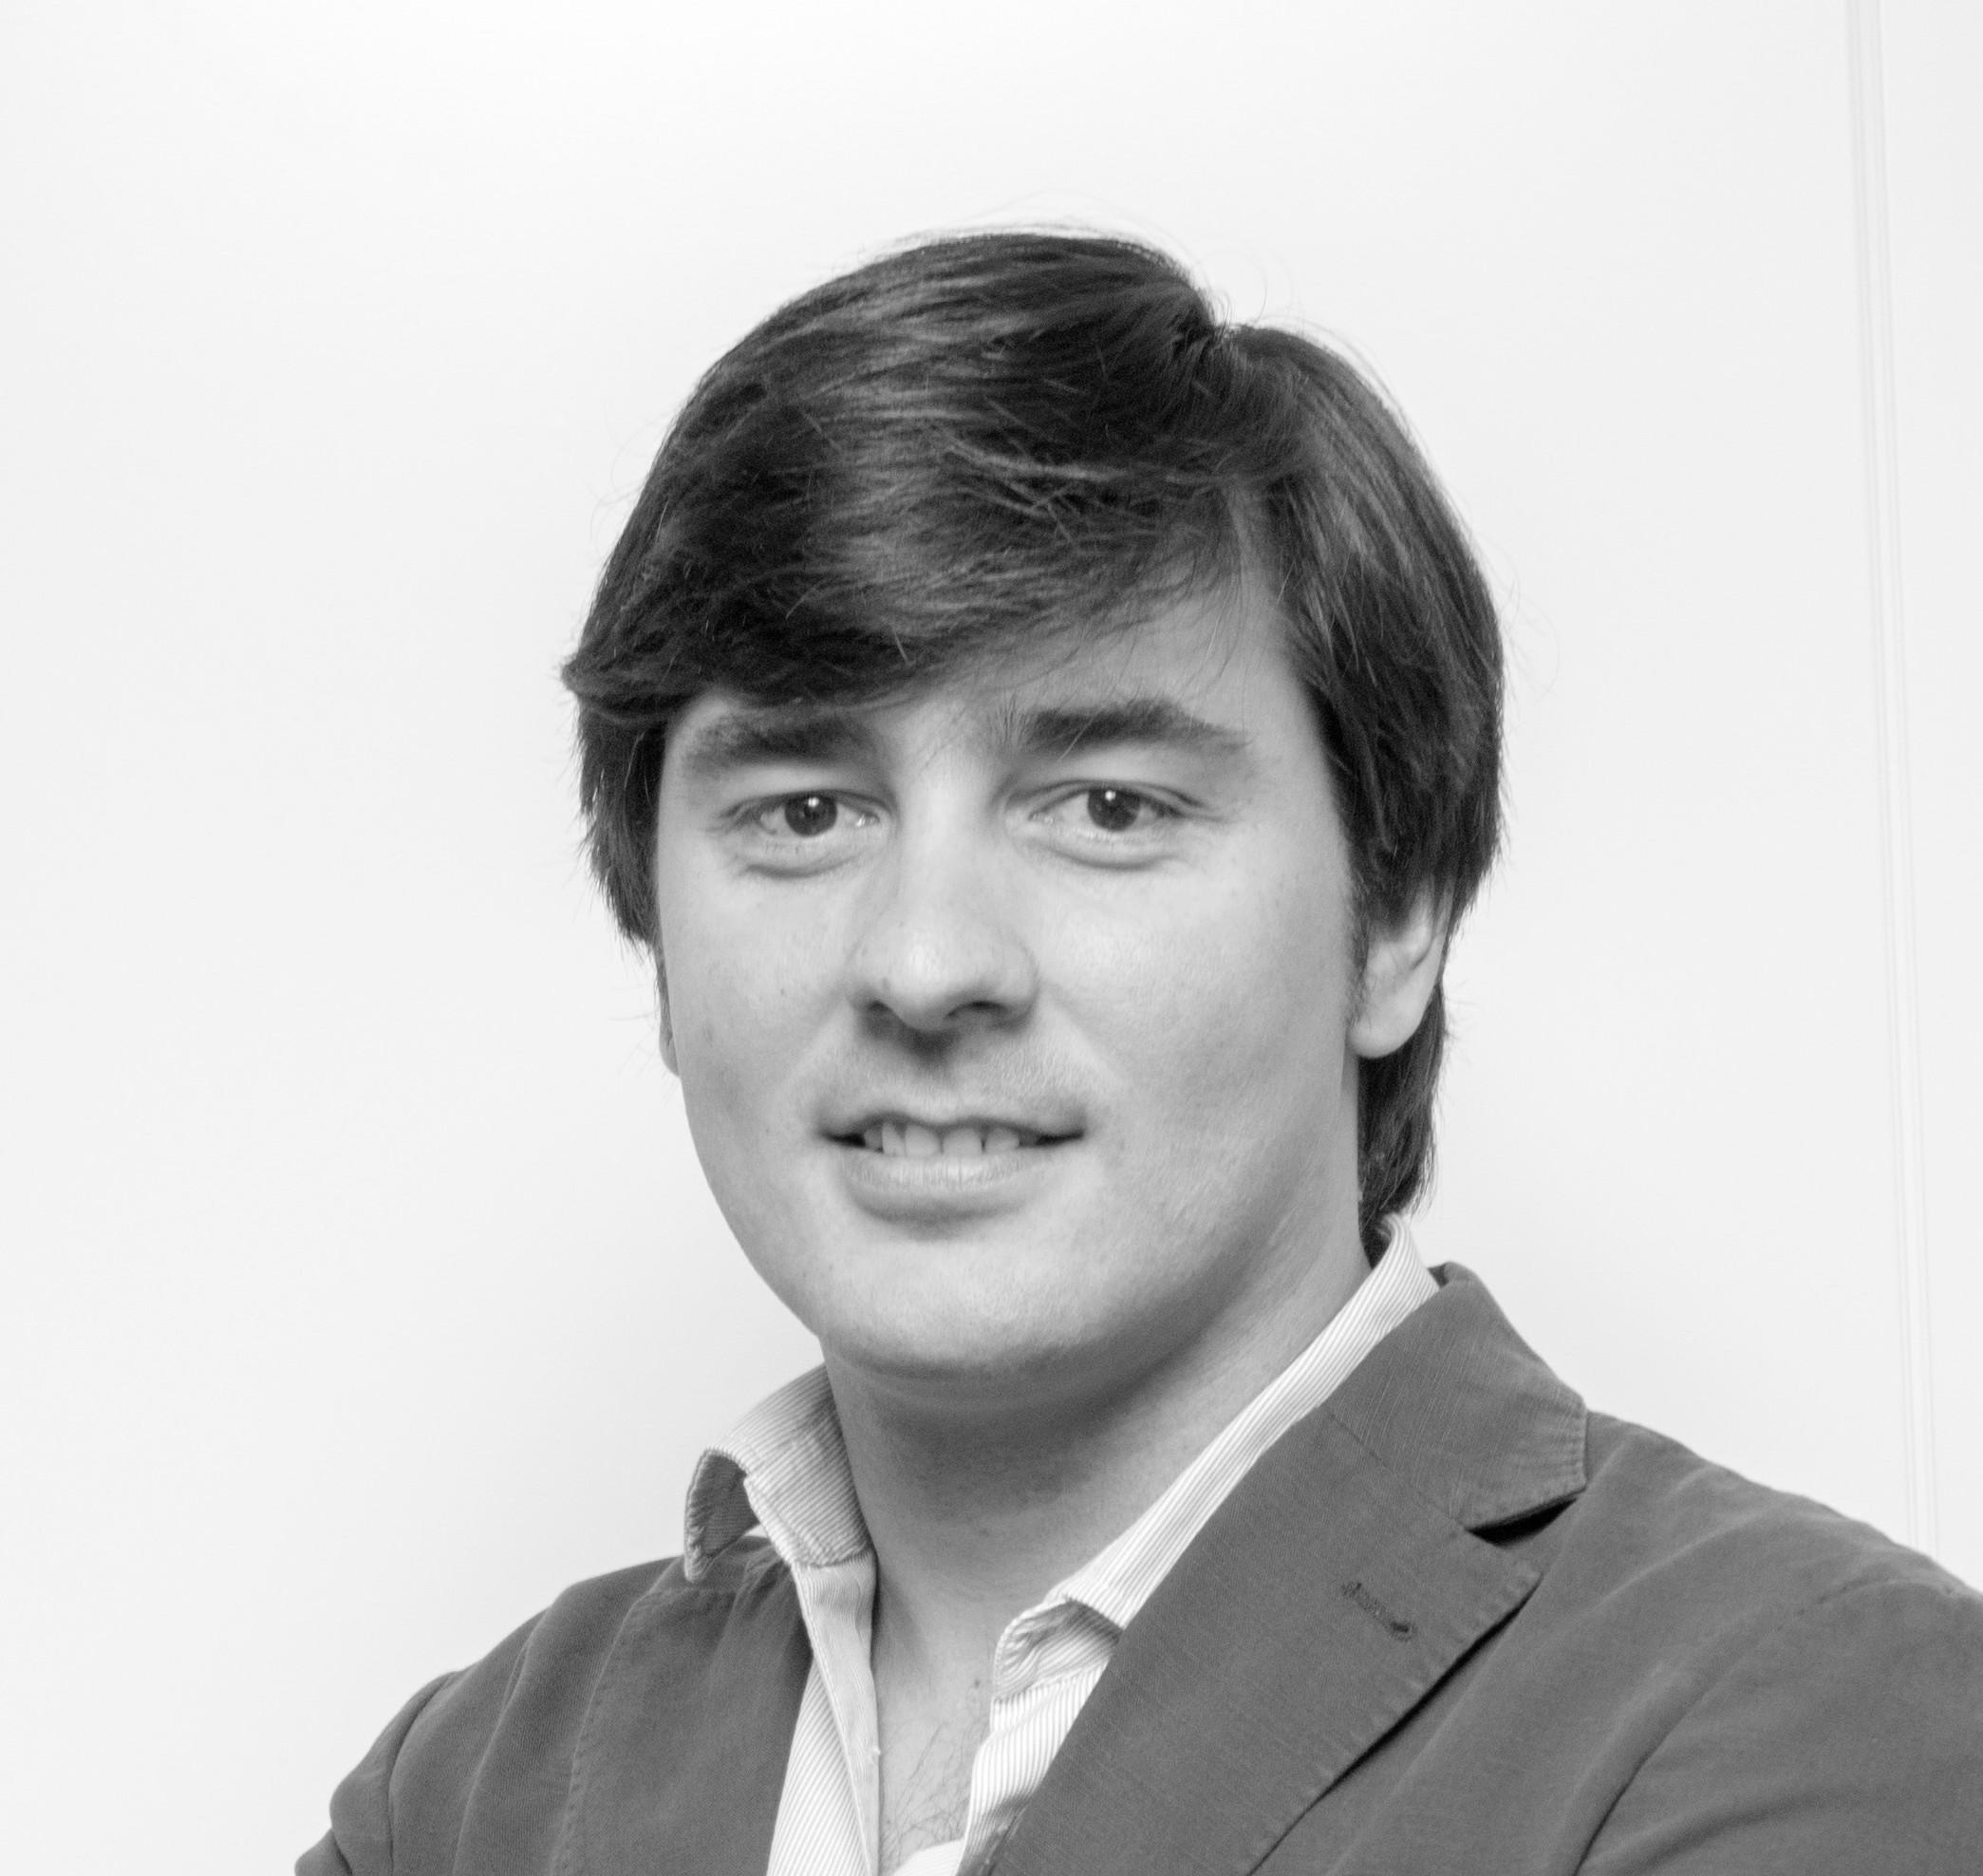 Patricio López de Carrizosa